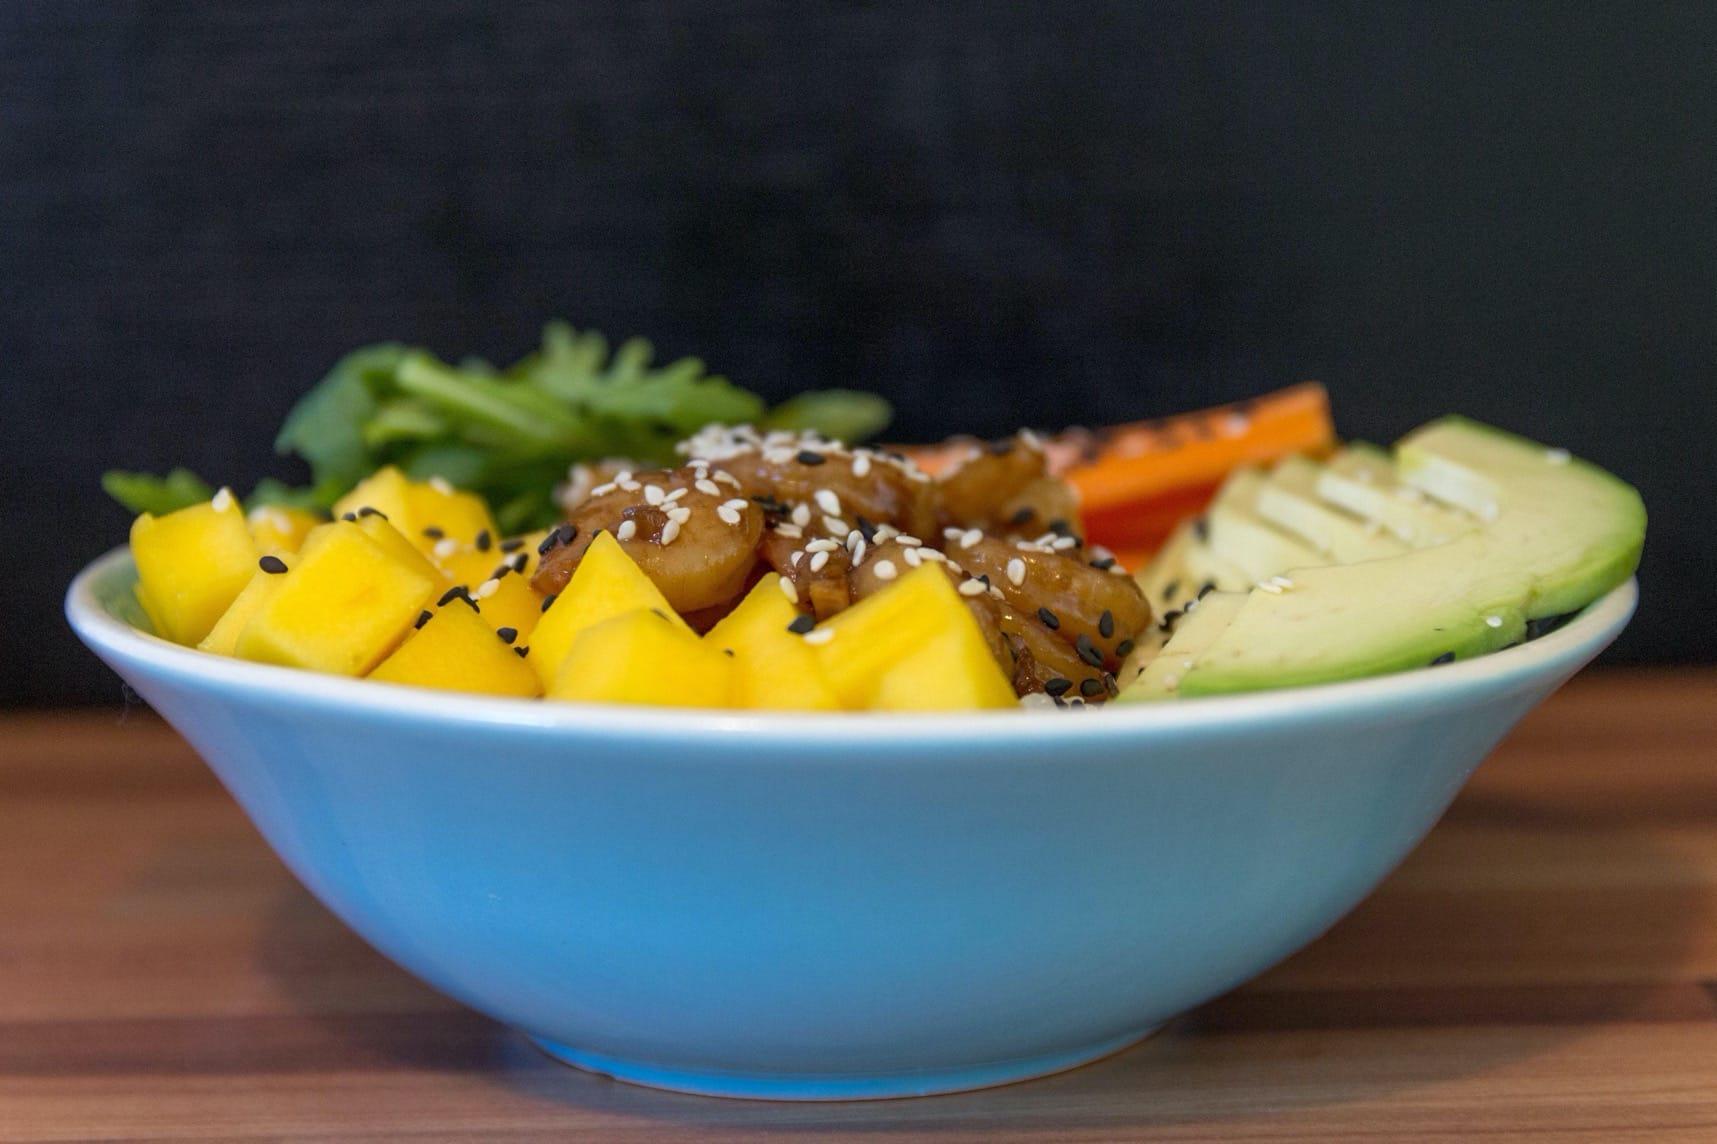 Teriyaki shrimp bowl – restované krevety se zeleninou